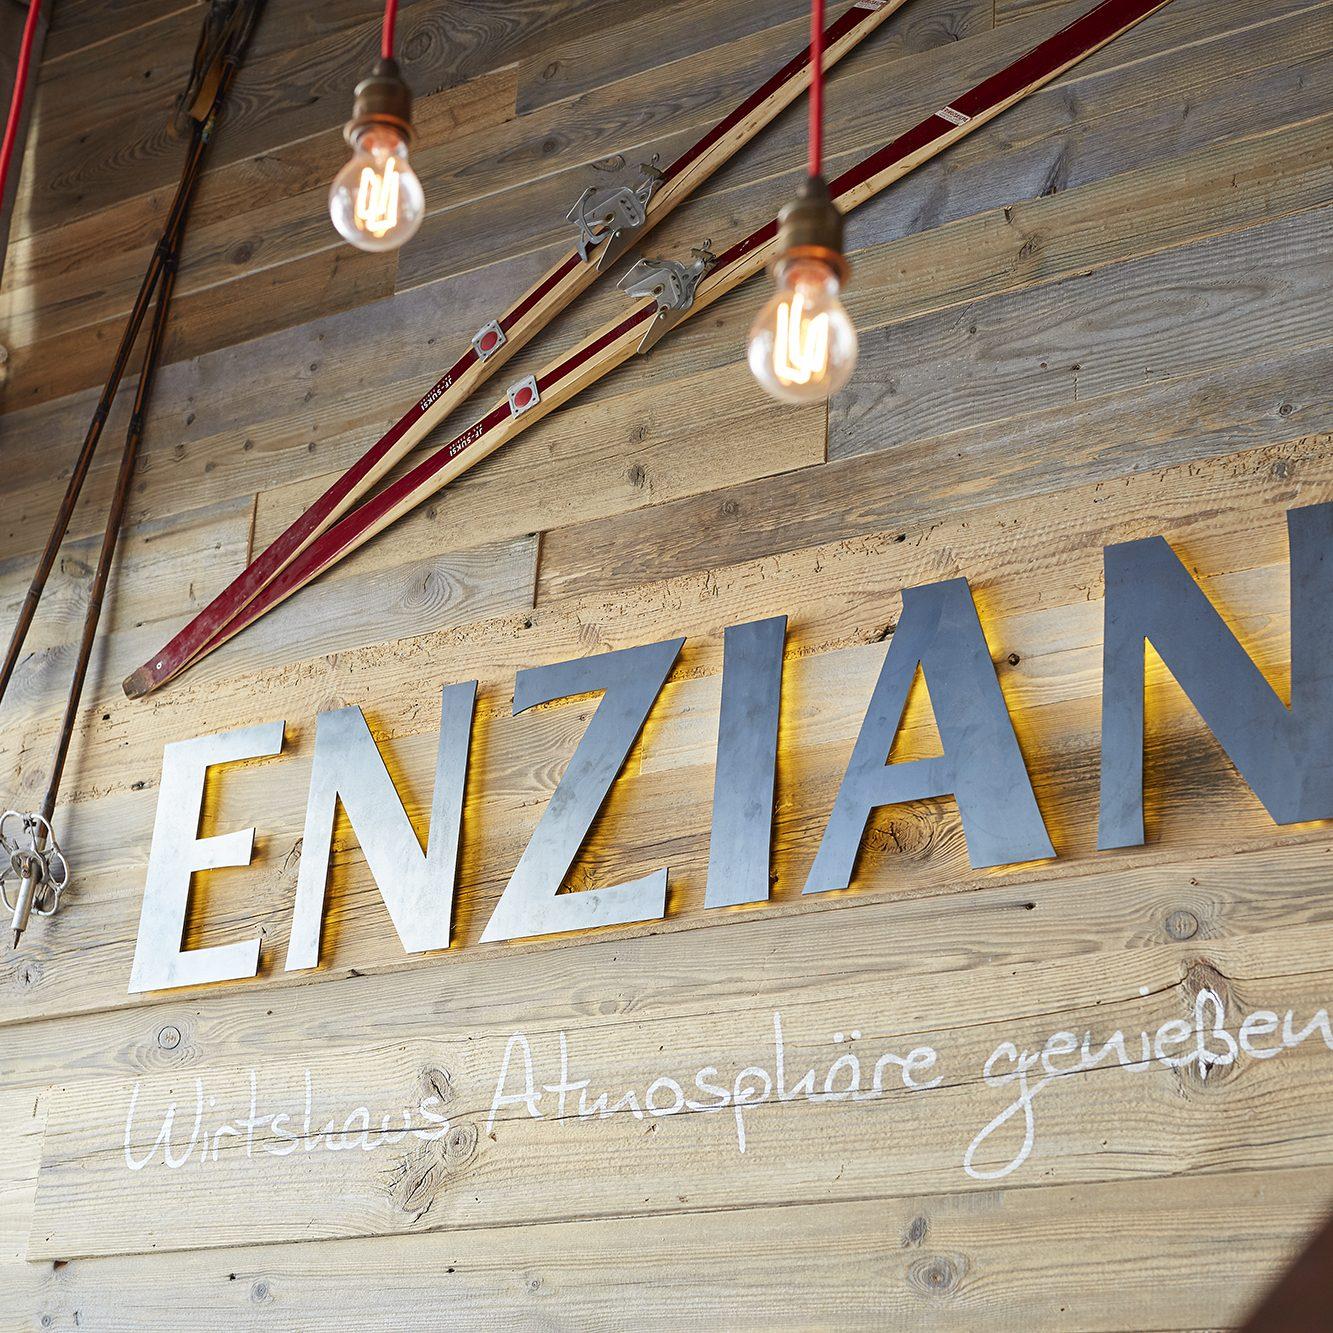 Enzian_Interior_Detail_01